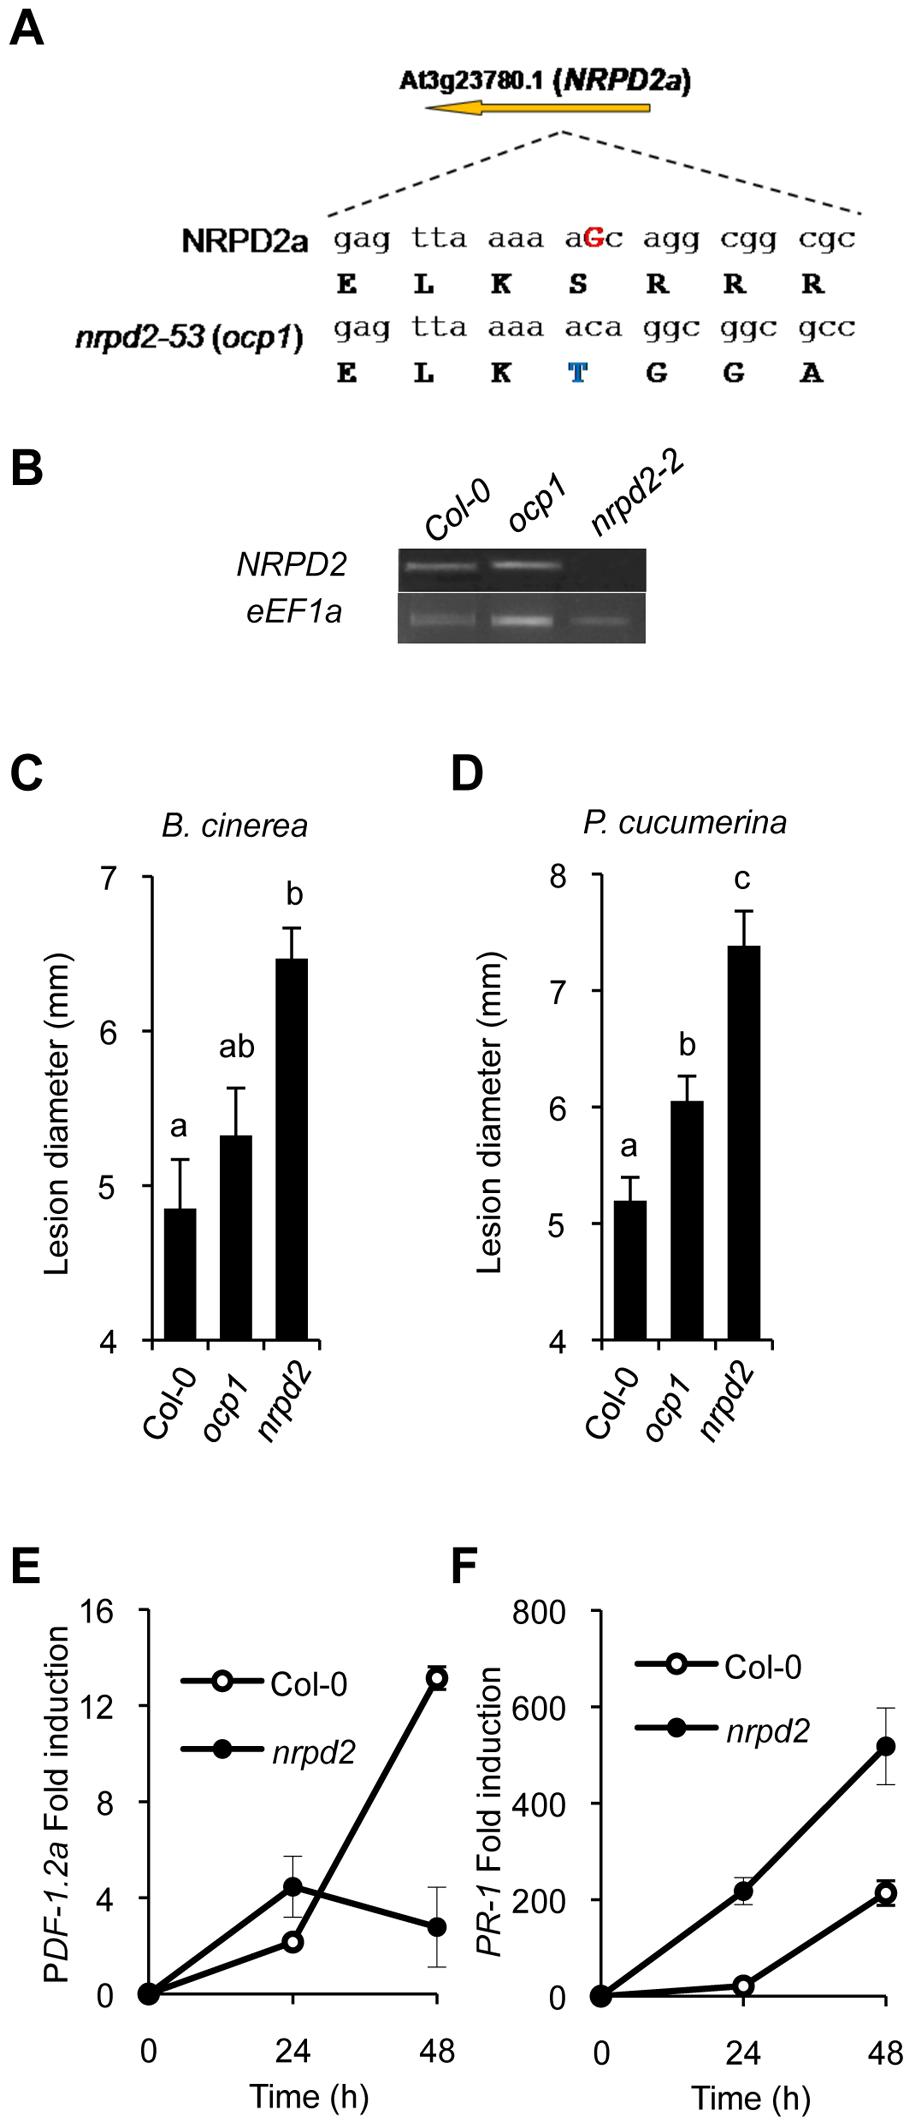 <i>ocp1</i> is a mutant allele of <i>NRPD2</i>.